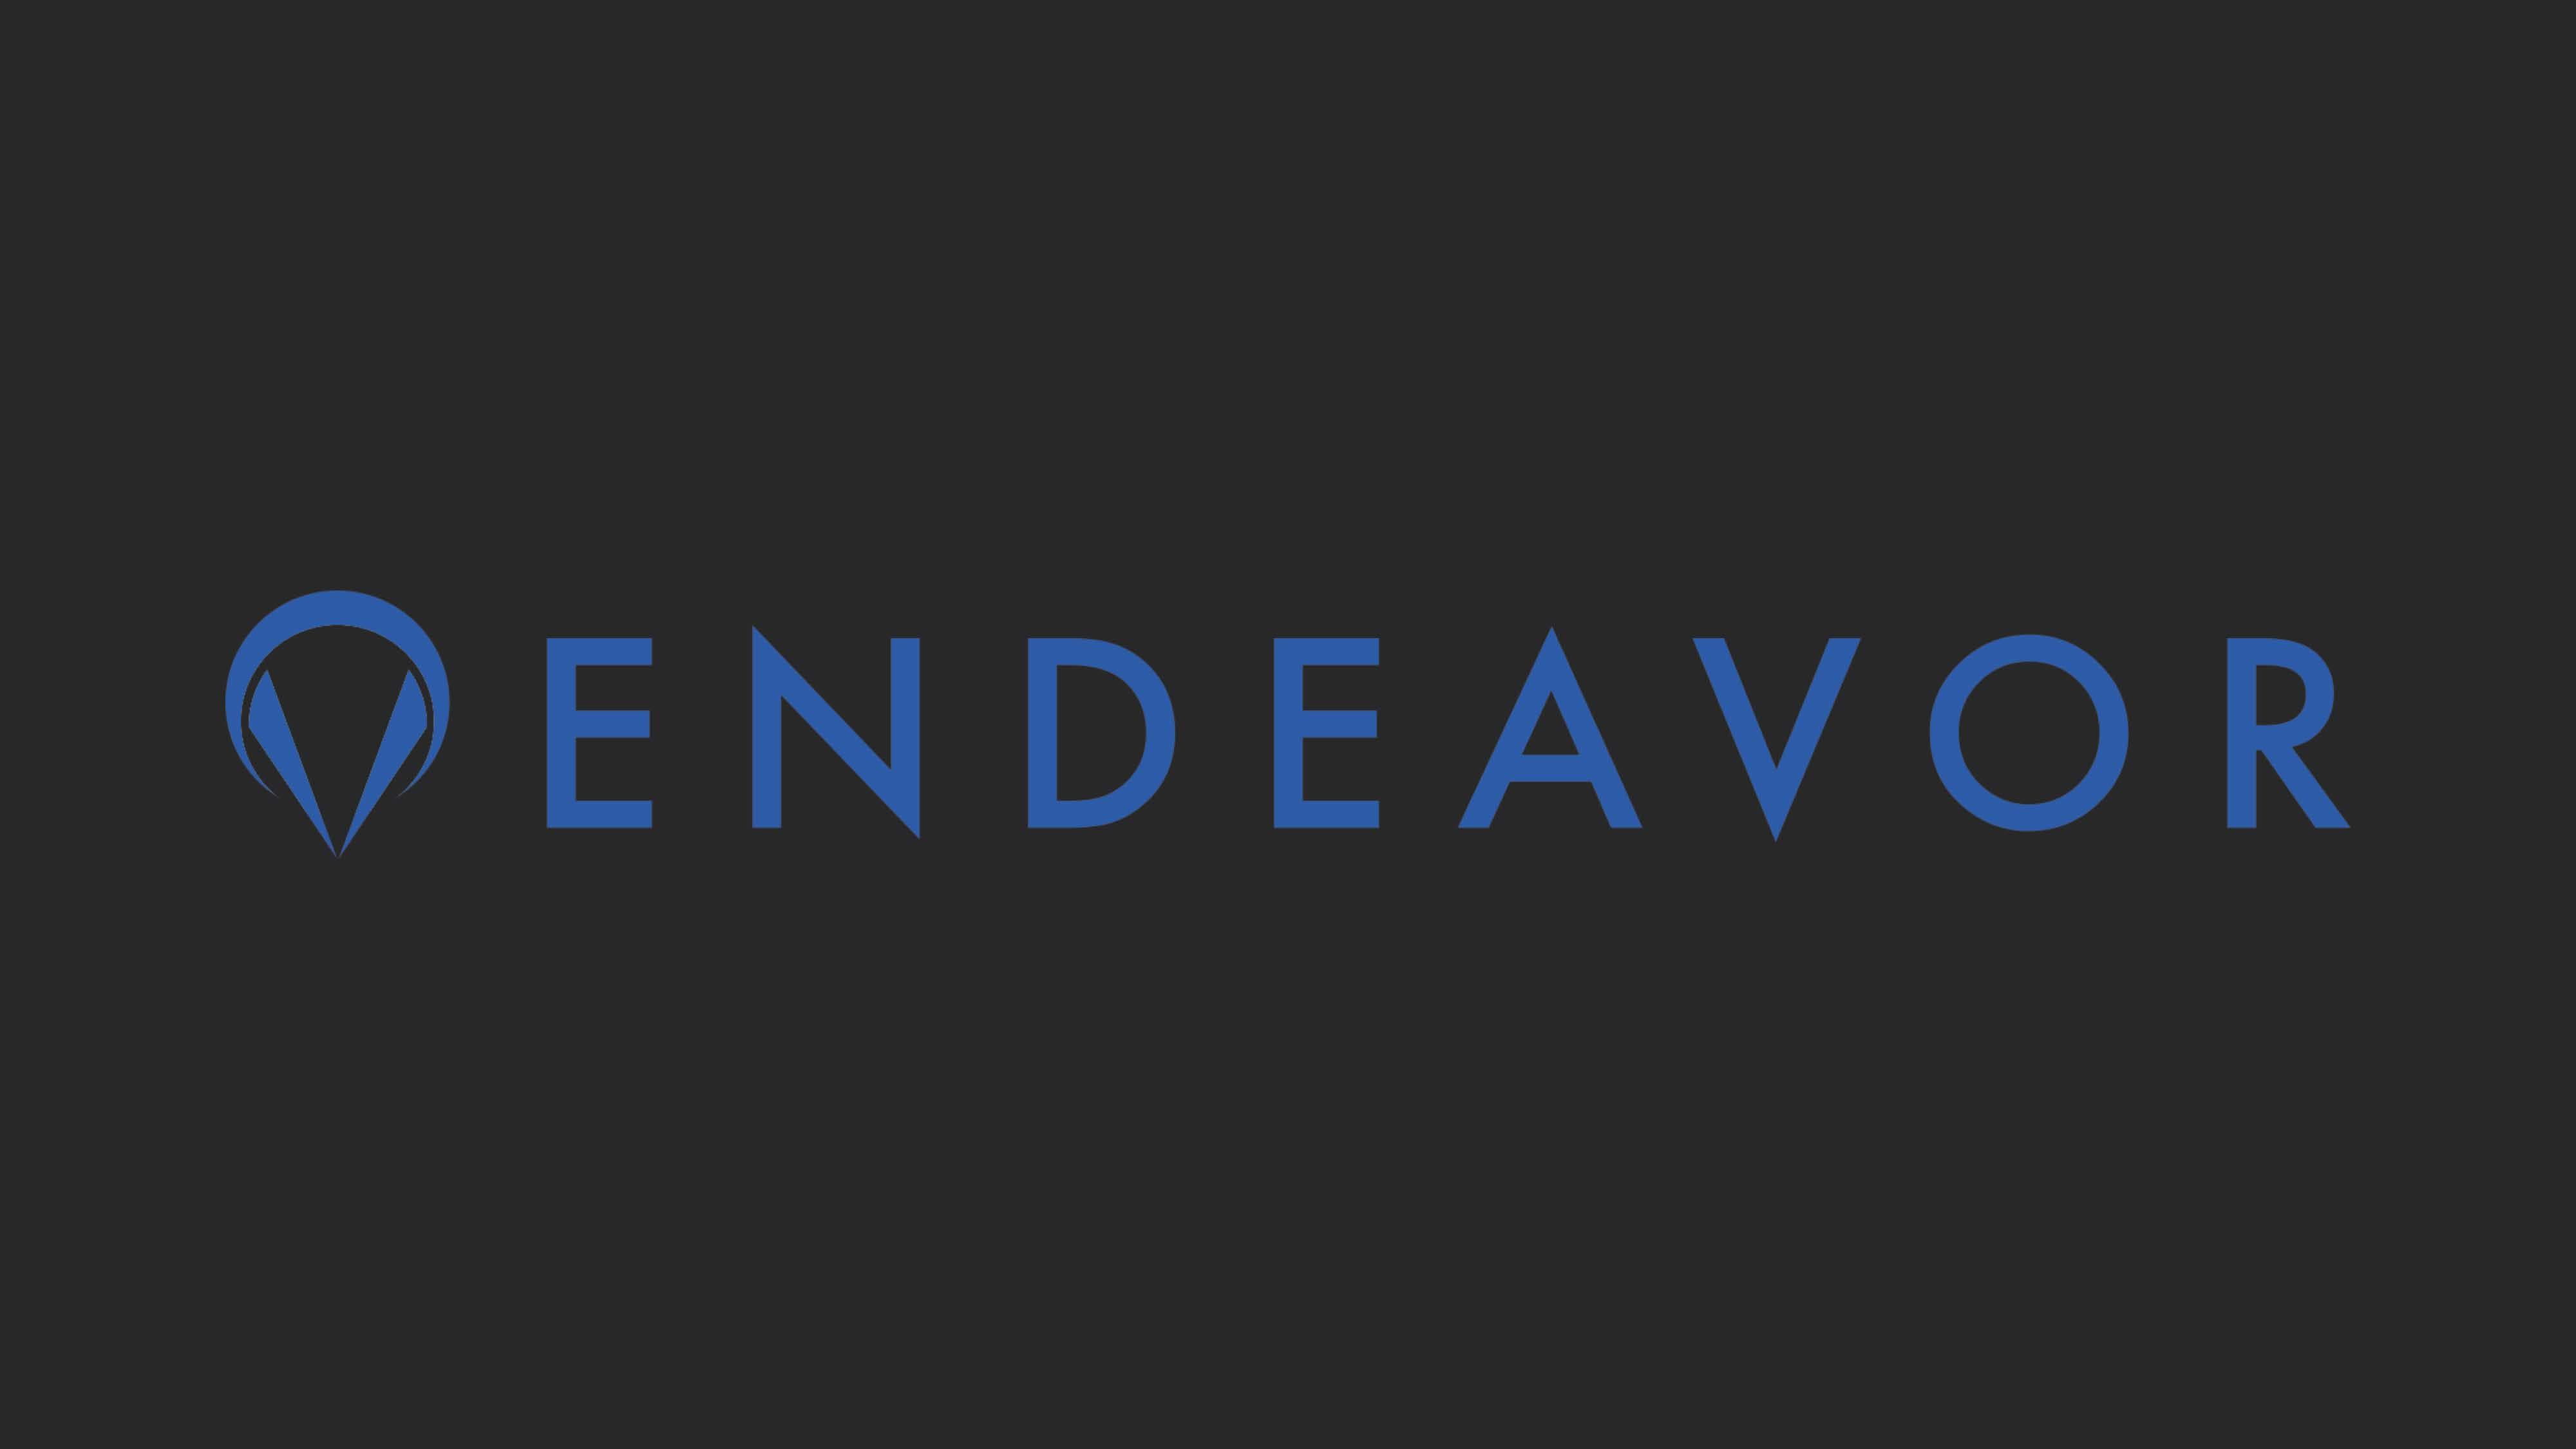 endeavor_22.jpg